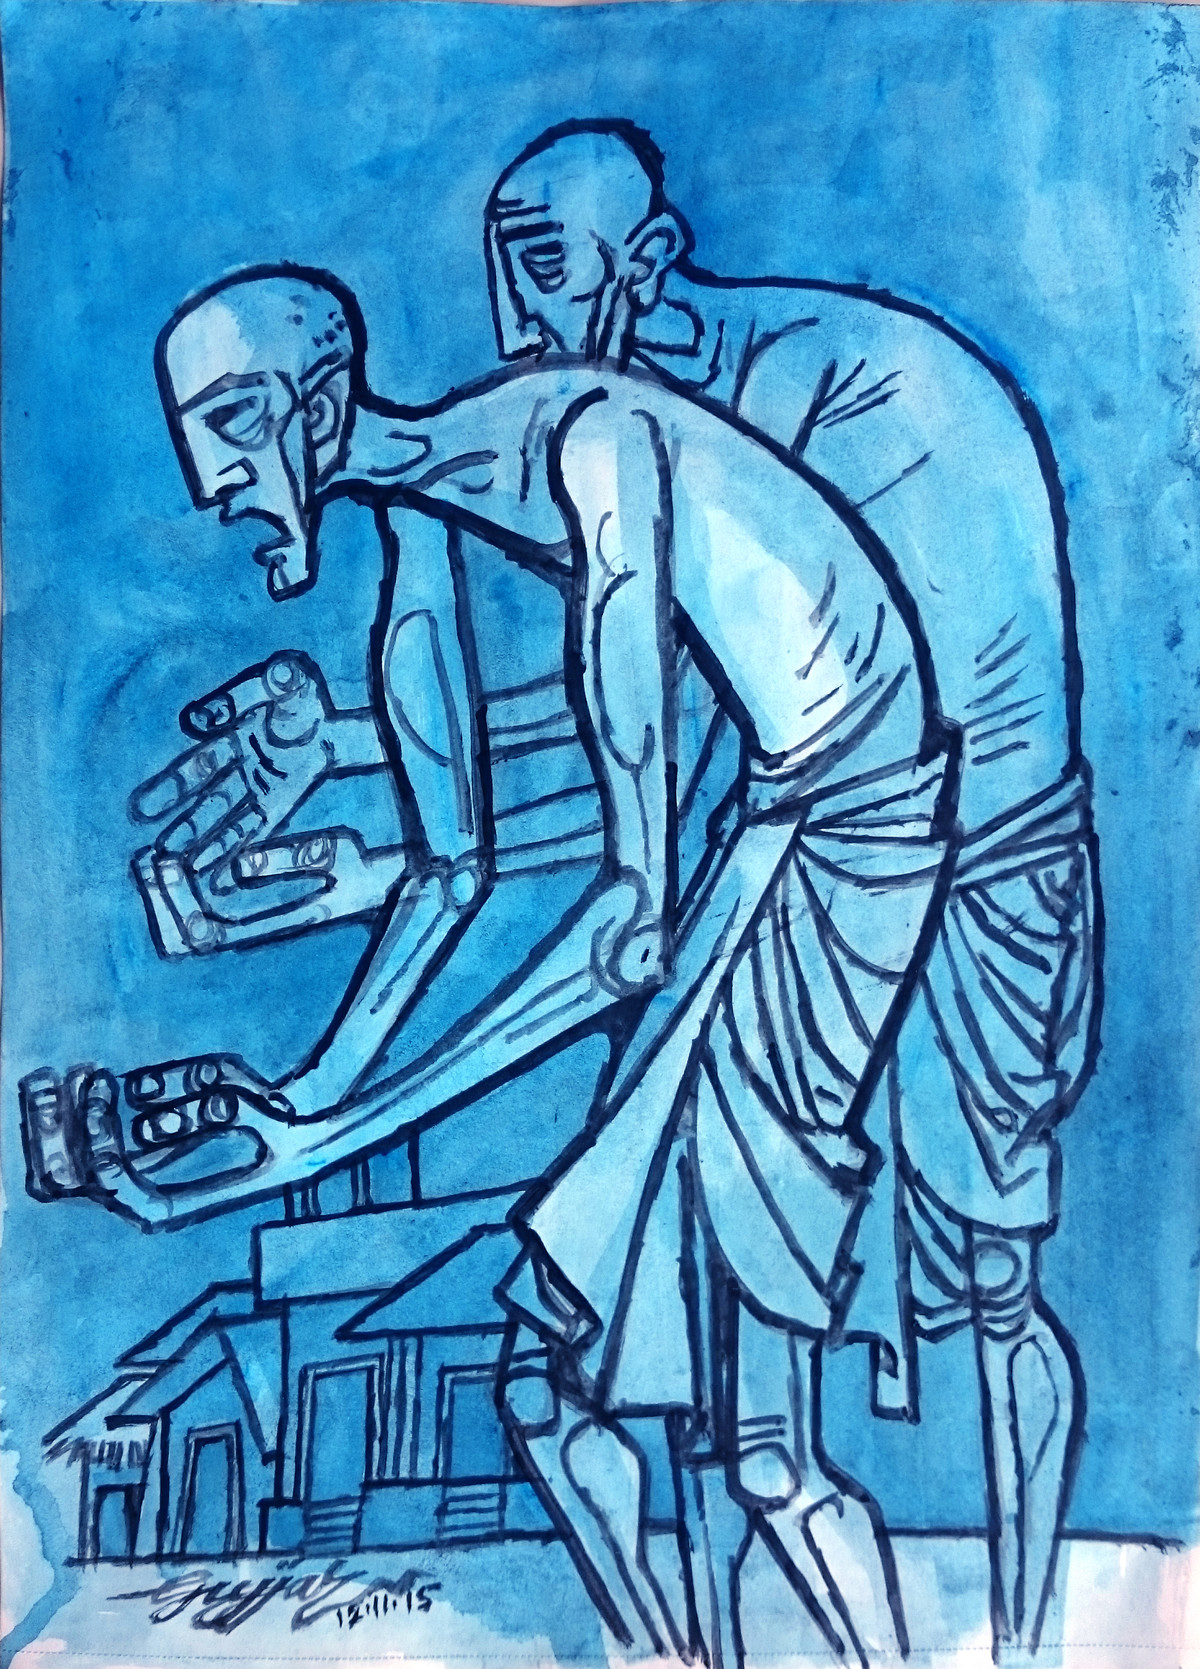 Two Old Men Digital Print by Gujjarappa B G,Expressionism